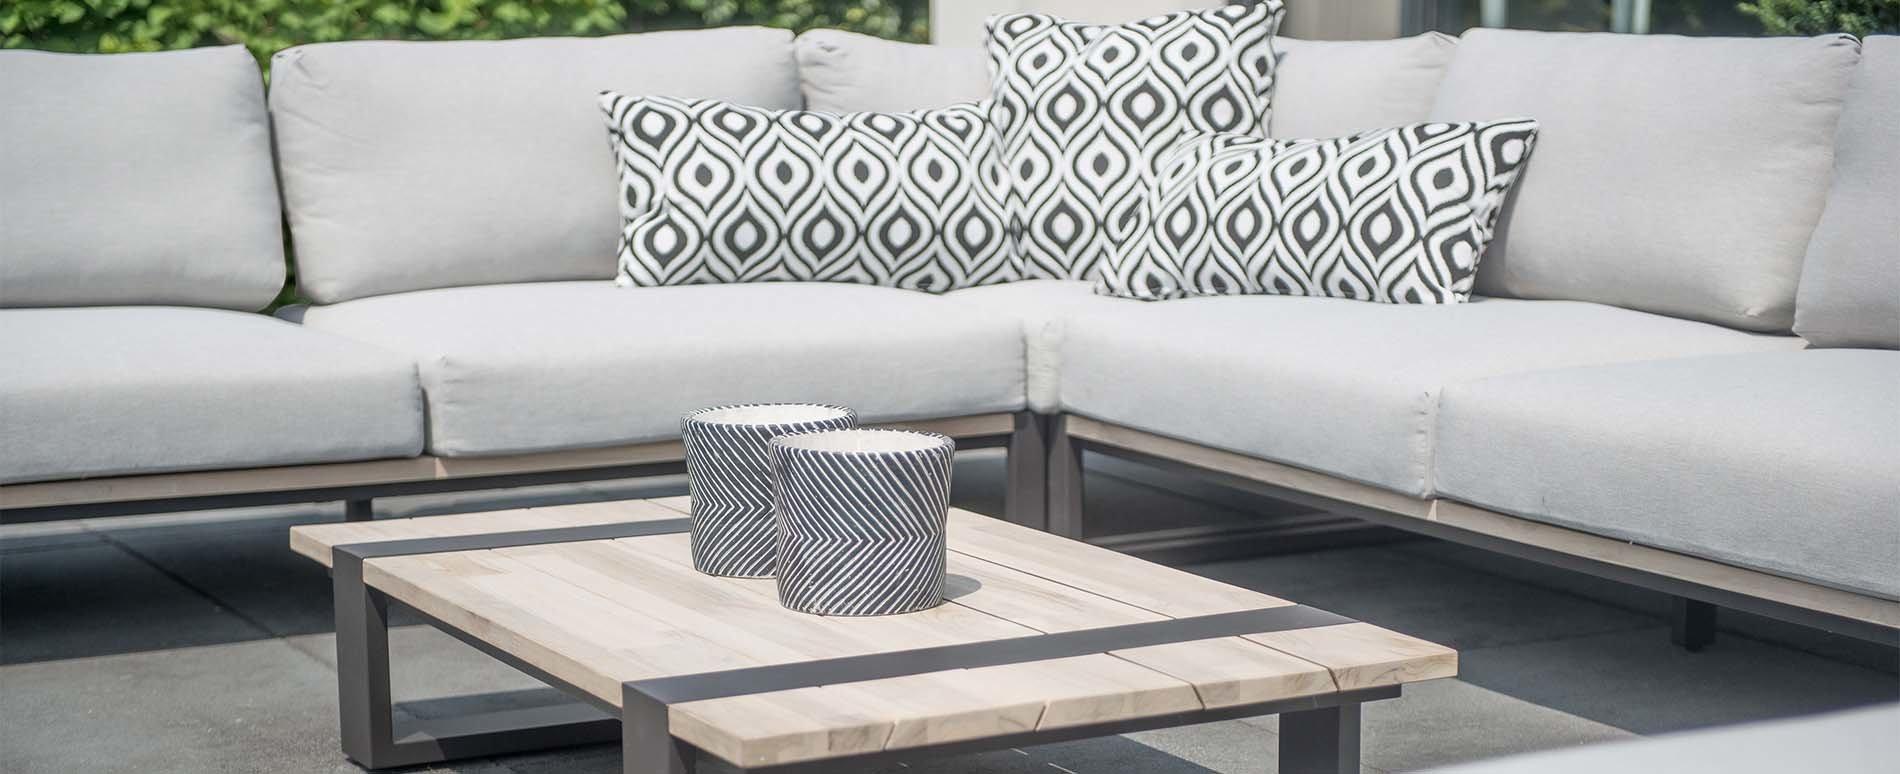 duke lounge sofa module teakholz aluminium bequeme gartenm bel. Black Bedroom Furniture Sets. Home Design Ideas